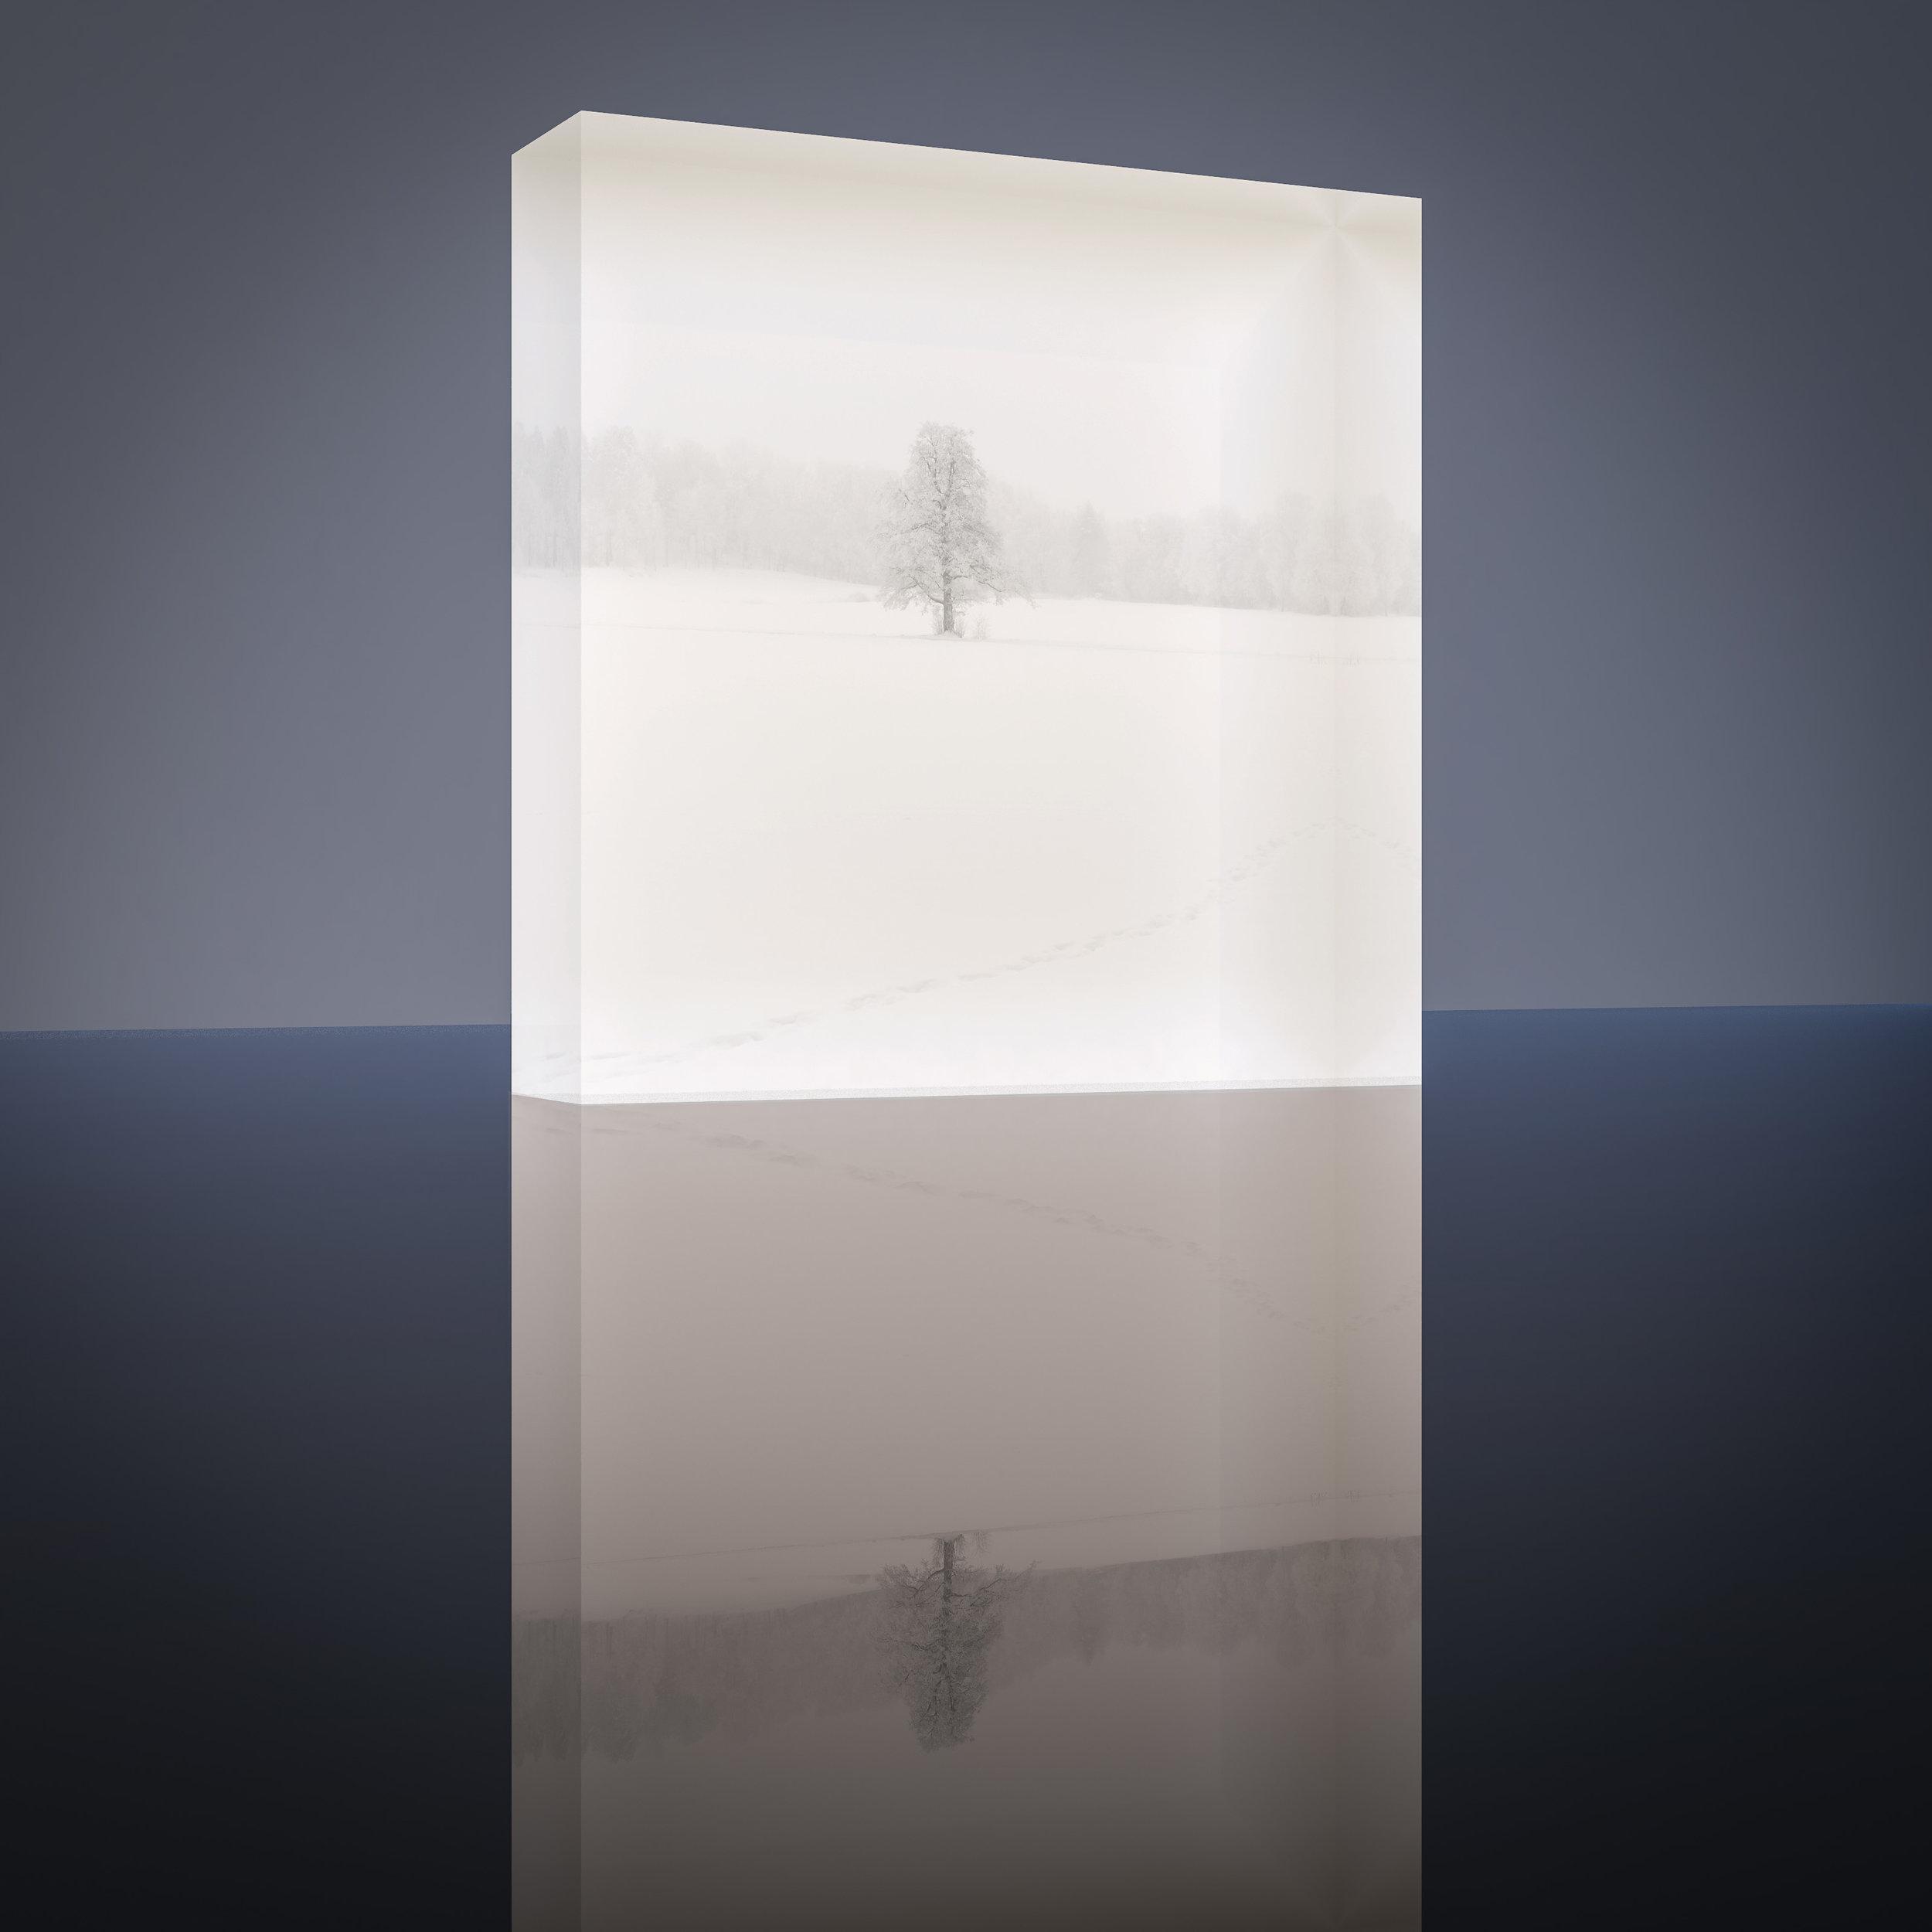 Tammi   Ruissalo, Turku, Finland Taidetuloste Akryylilasilla #1/30  Size: 10 L x 10 K x 3 S [cm] #1/30